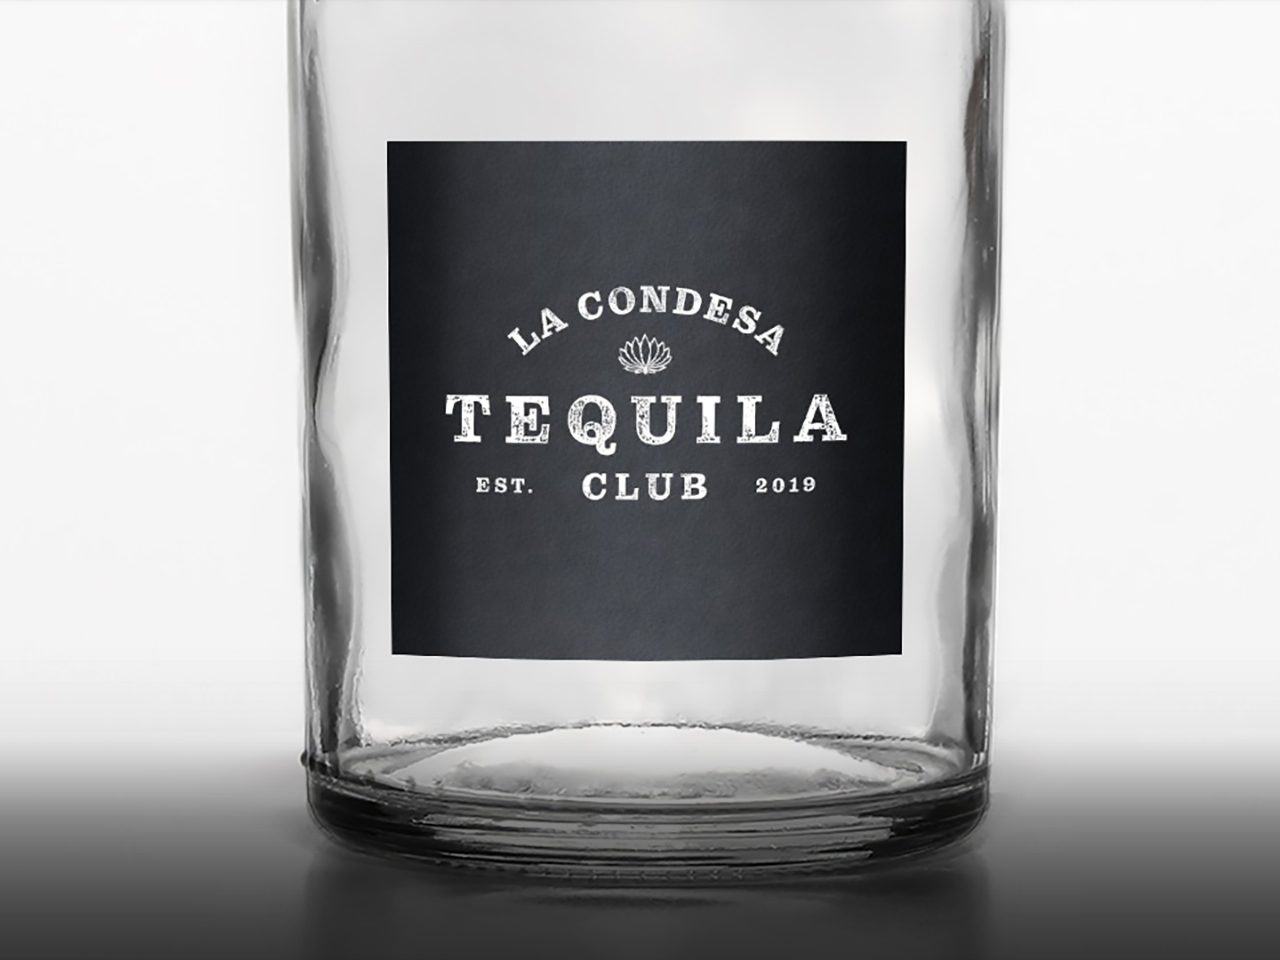 TequilaBottle_02